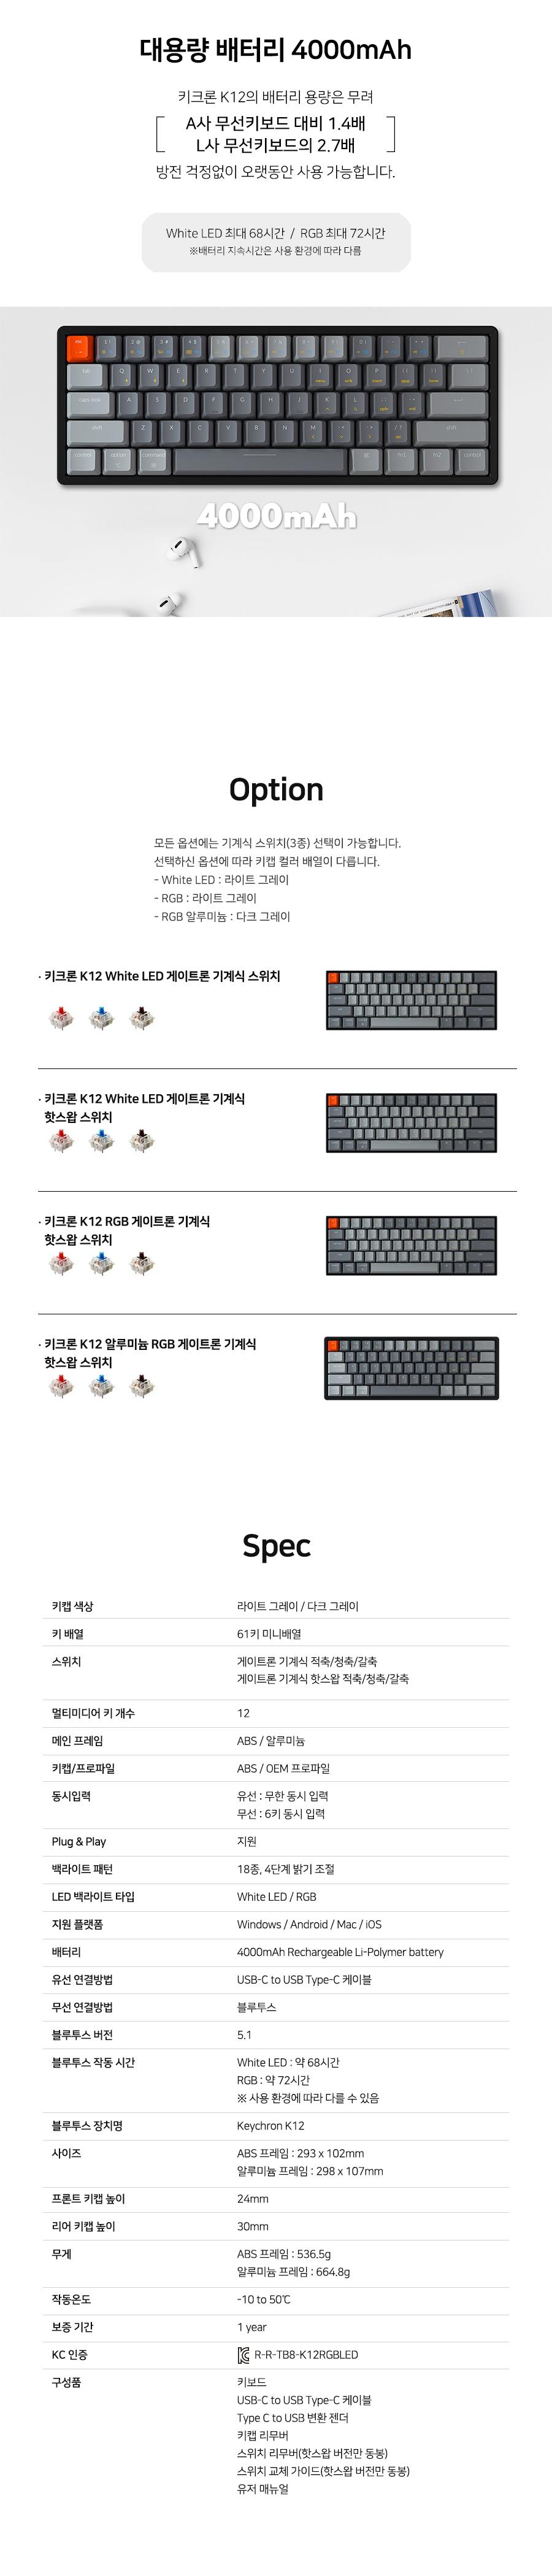 Keychron K12 RGB 핫스왑 (적축)